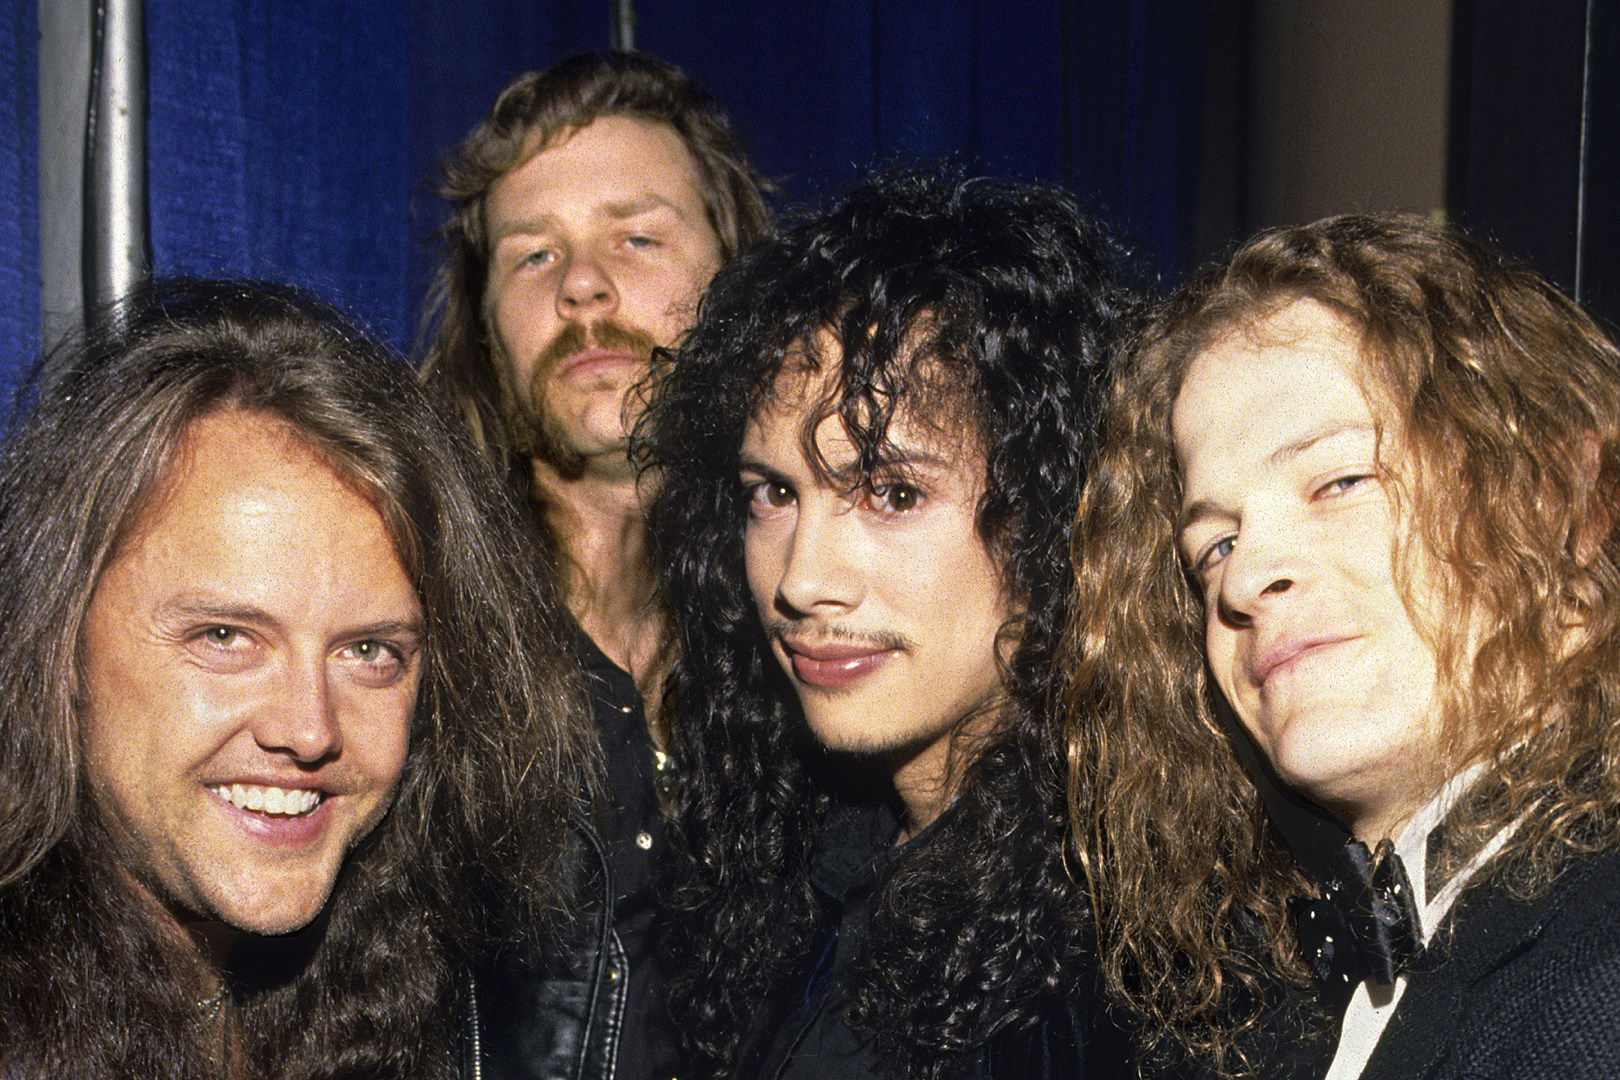 Metallica's 'Black Album' Retakes the Charts, Reissue Hits No. 1